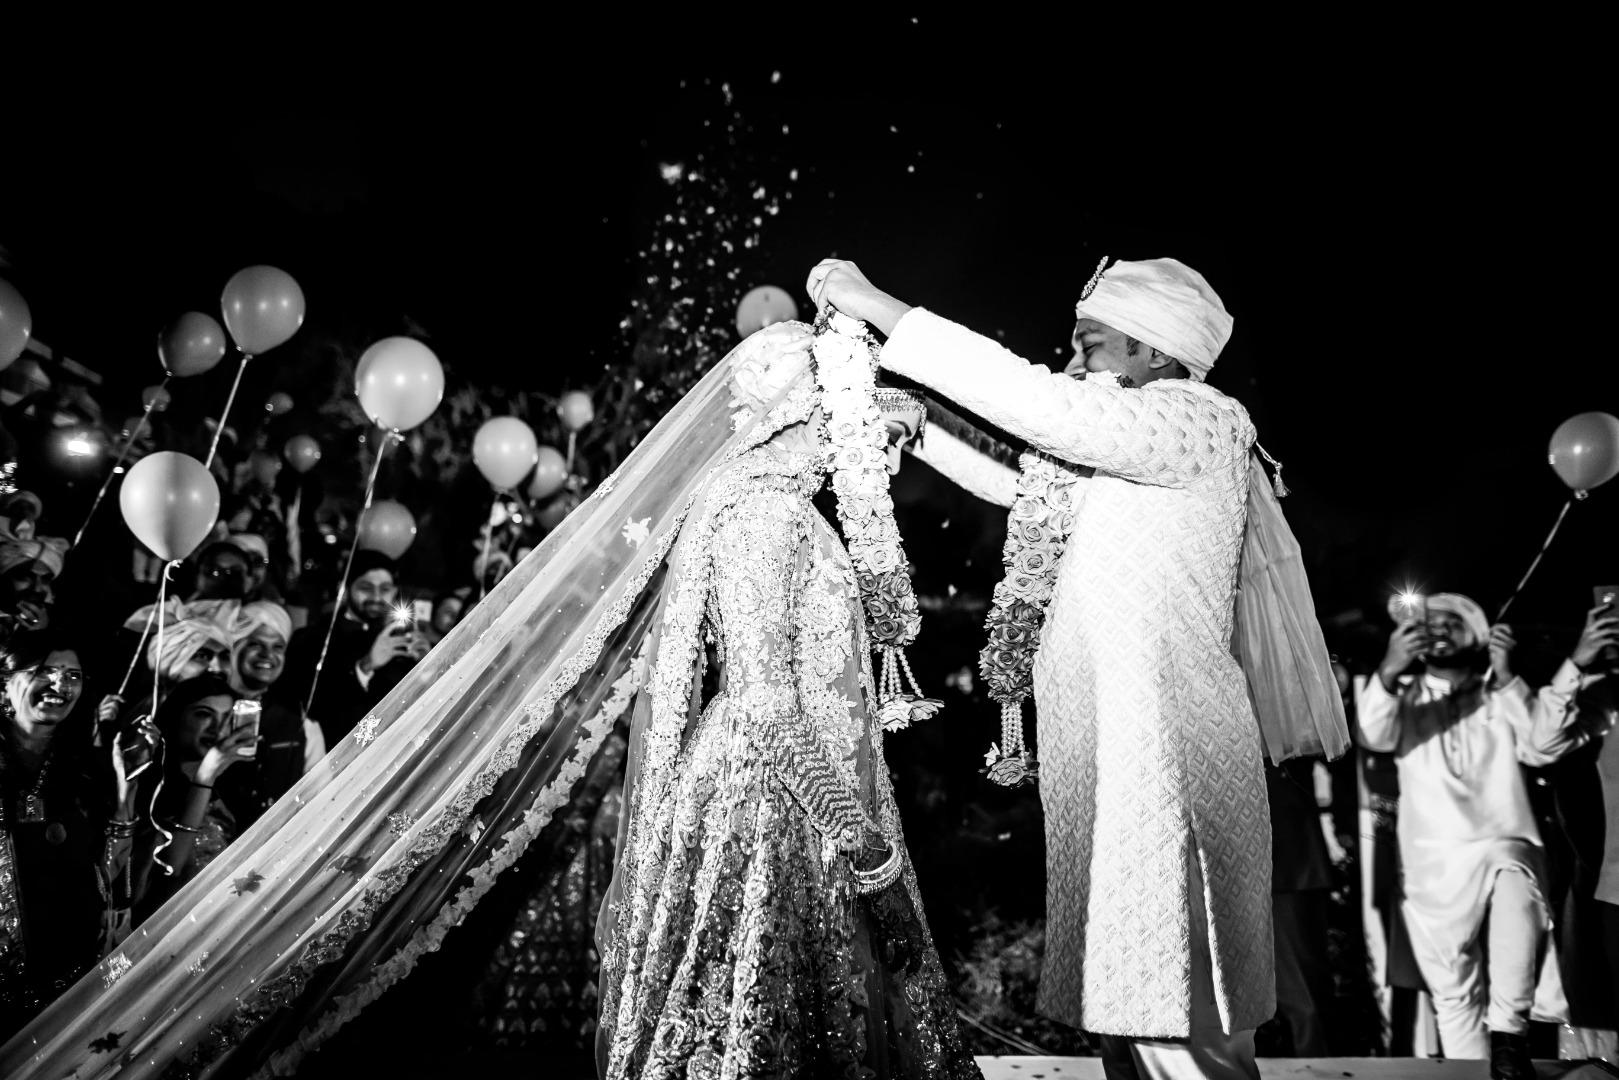 Stunning Black and White Wedding Portrait